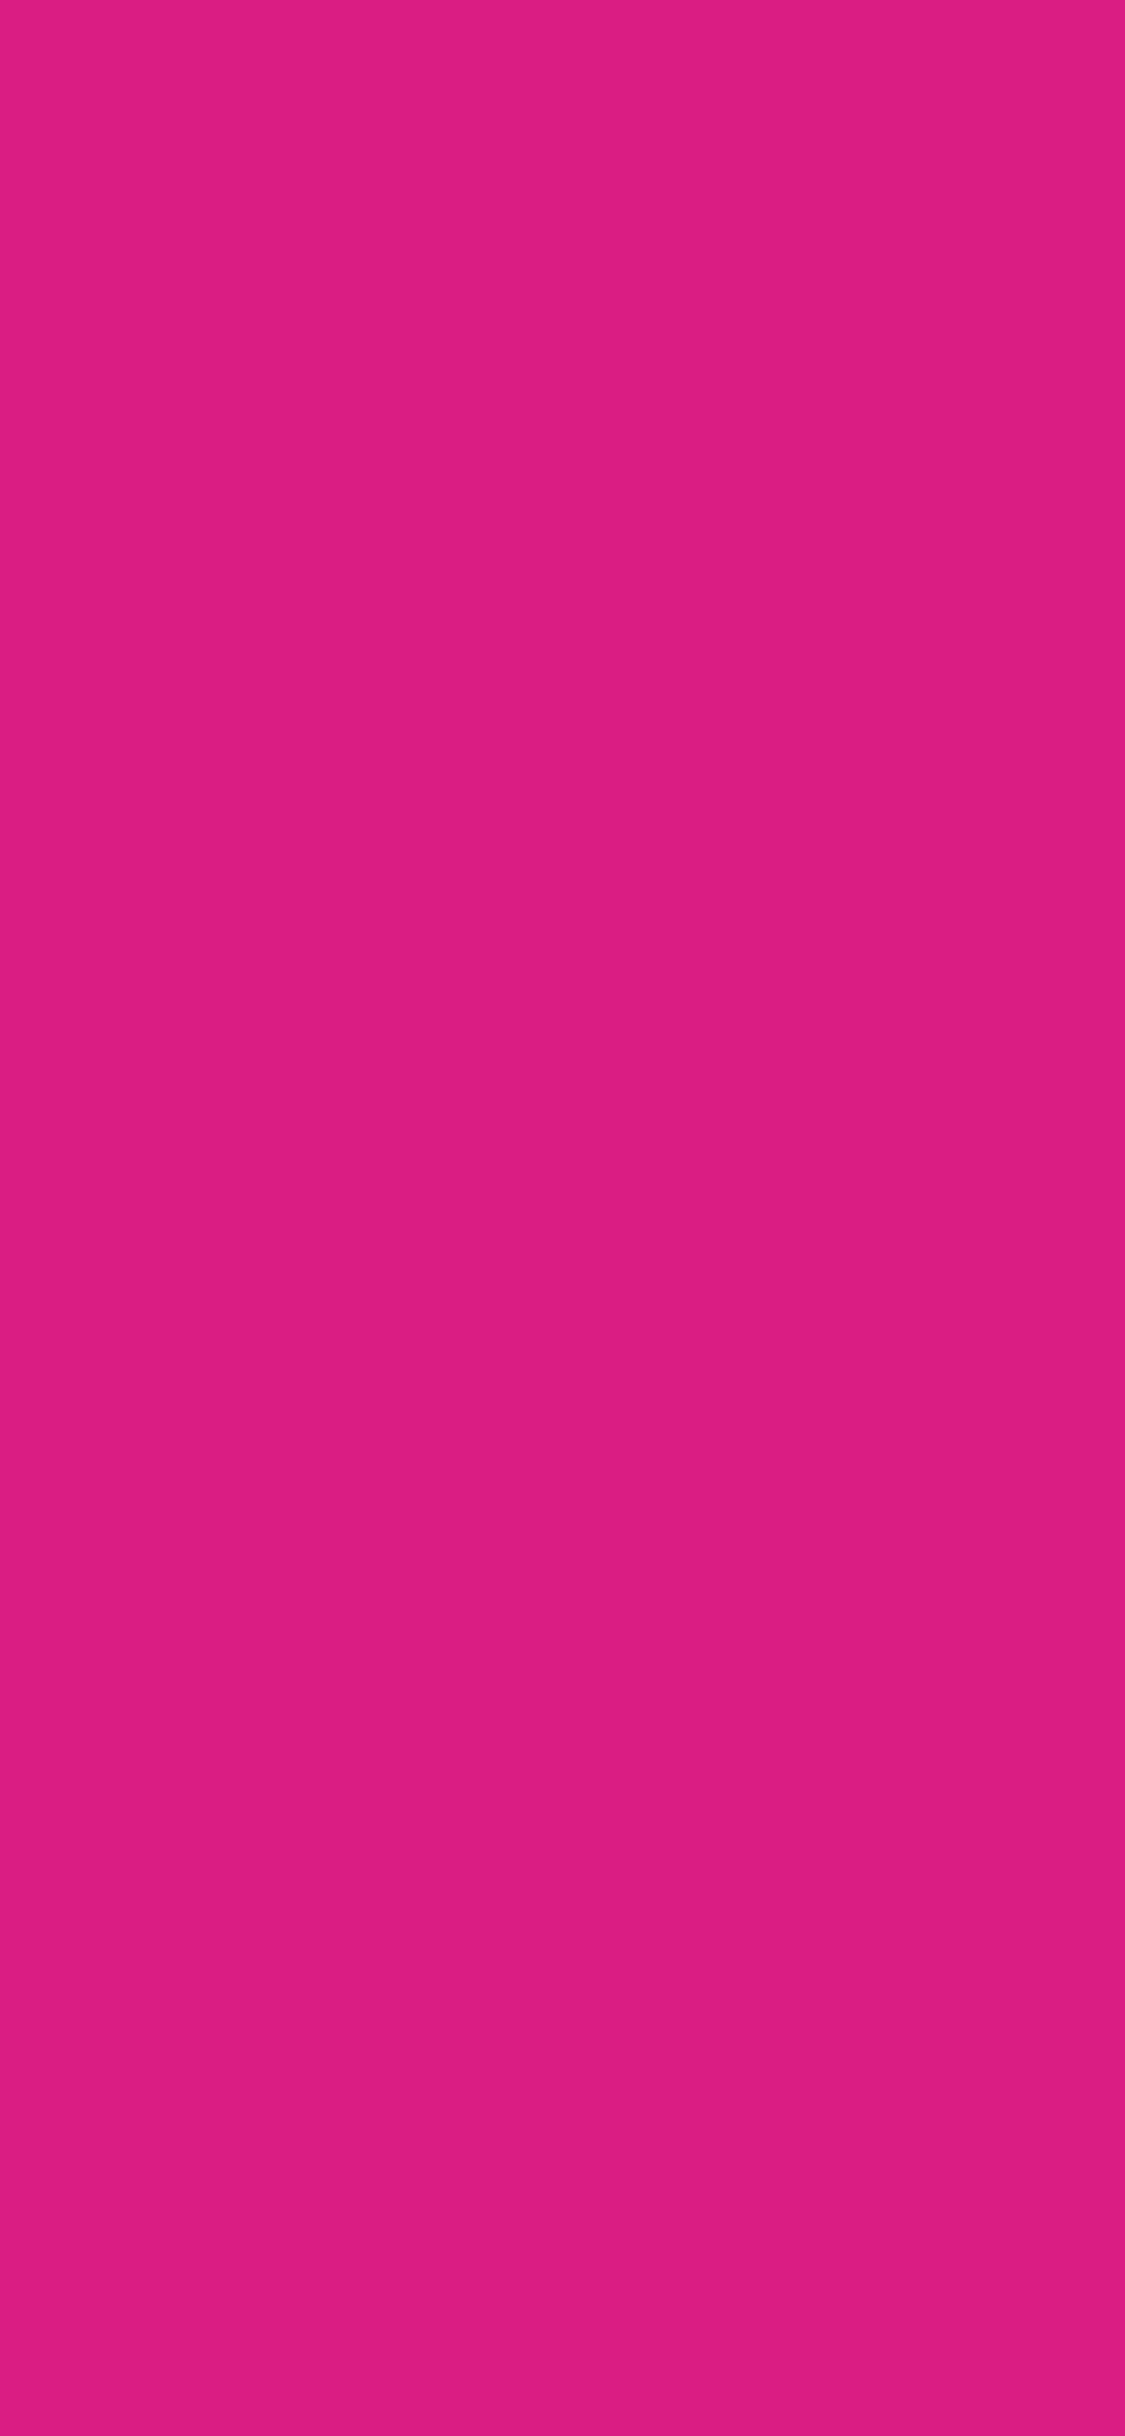 1125x2436 Vivid Cerise Solid Color Background